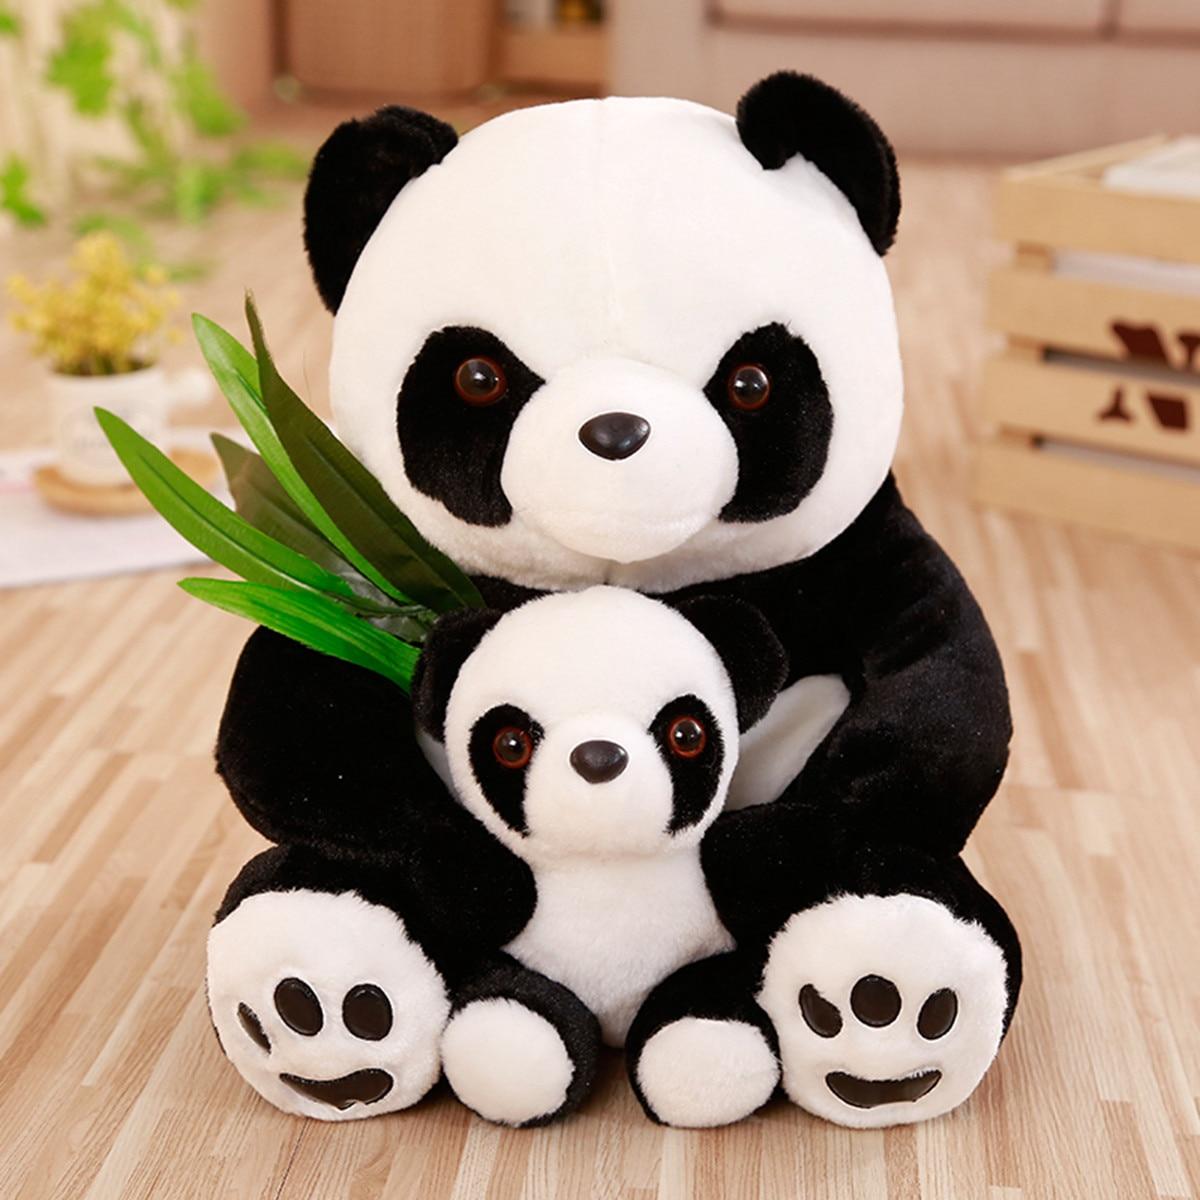 25-50cm Panda Plush Sitting Mother and Baby Panda Plush Toys Stuffed Panda Dolls Soft Pillows Kids Toys Kawaii Plush Cute Gifts